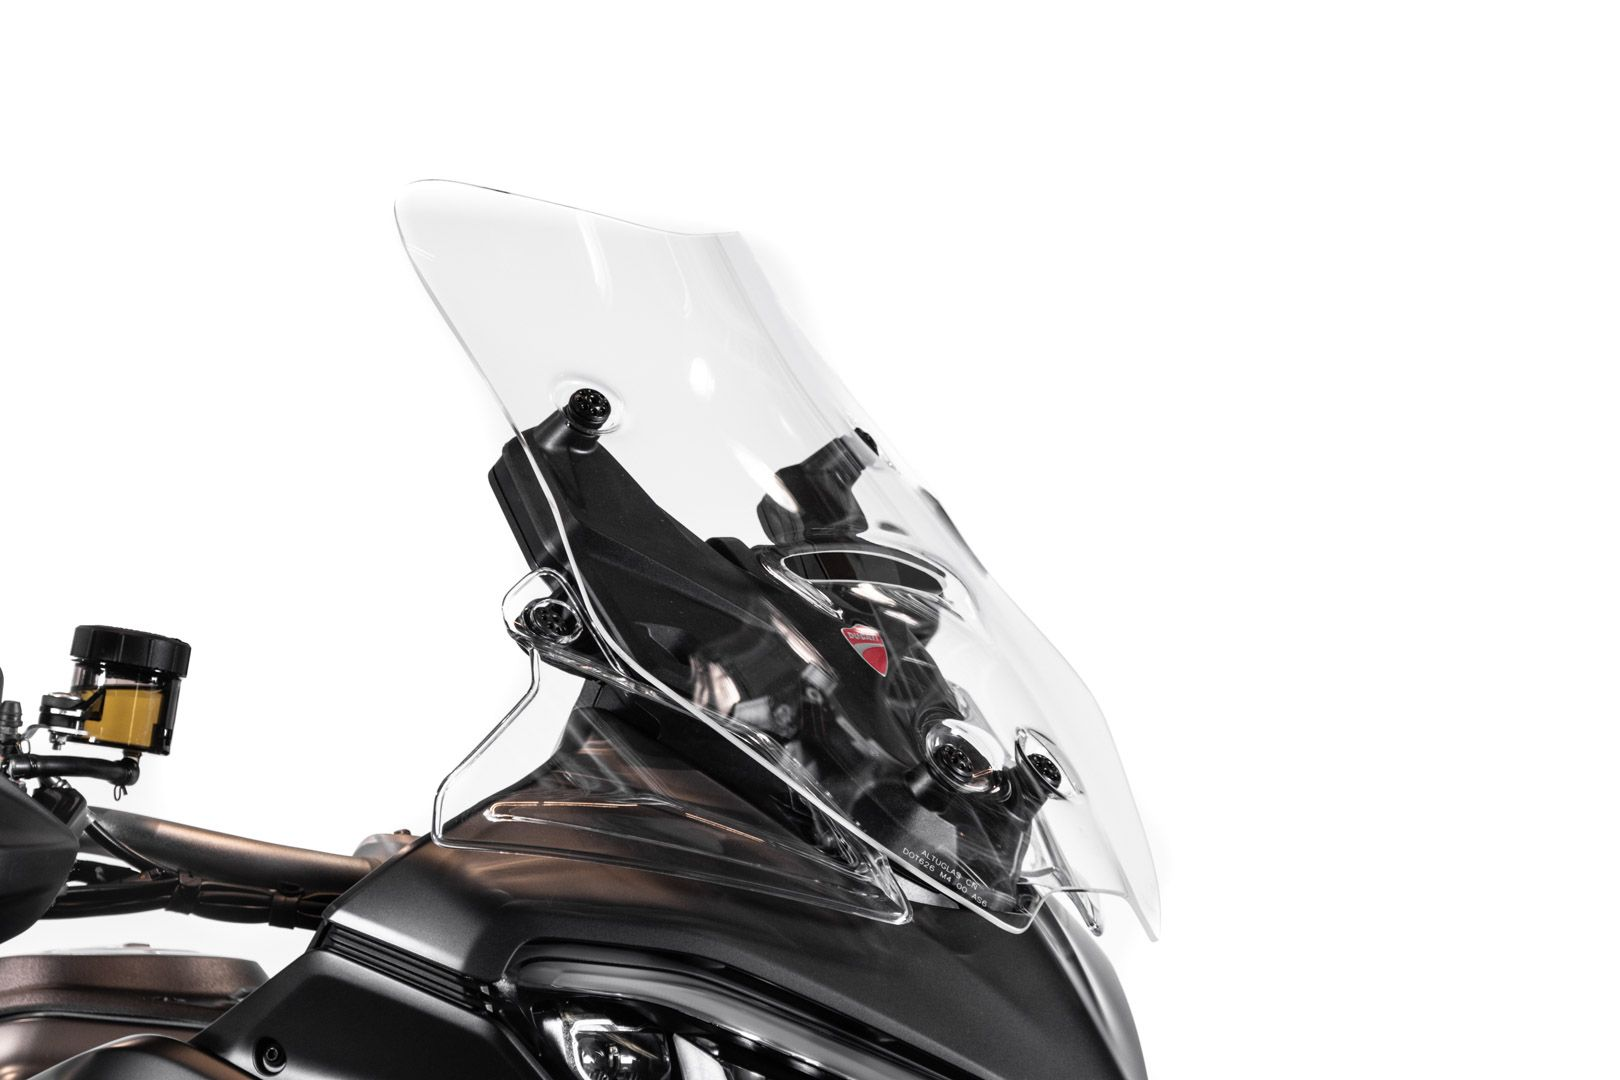 2021 Ducati MULTISTRADA V4 AVIATOR GREY FULL 84049